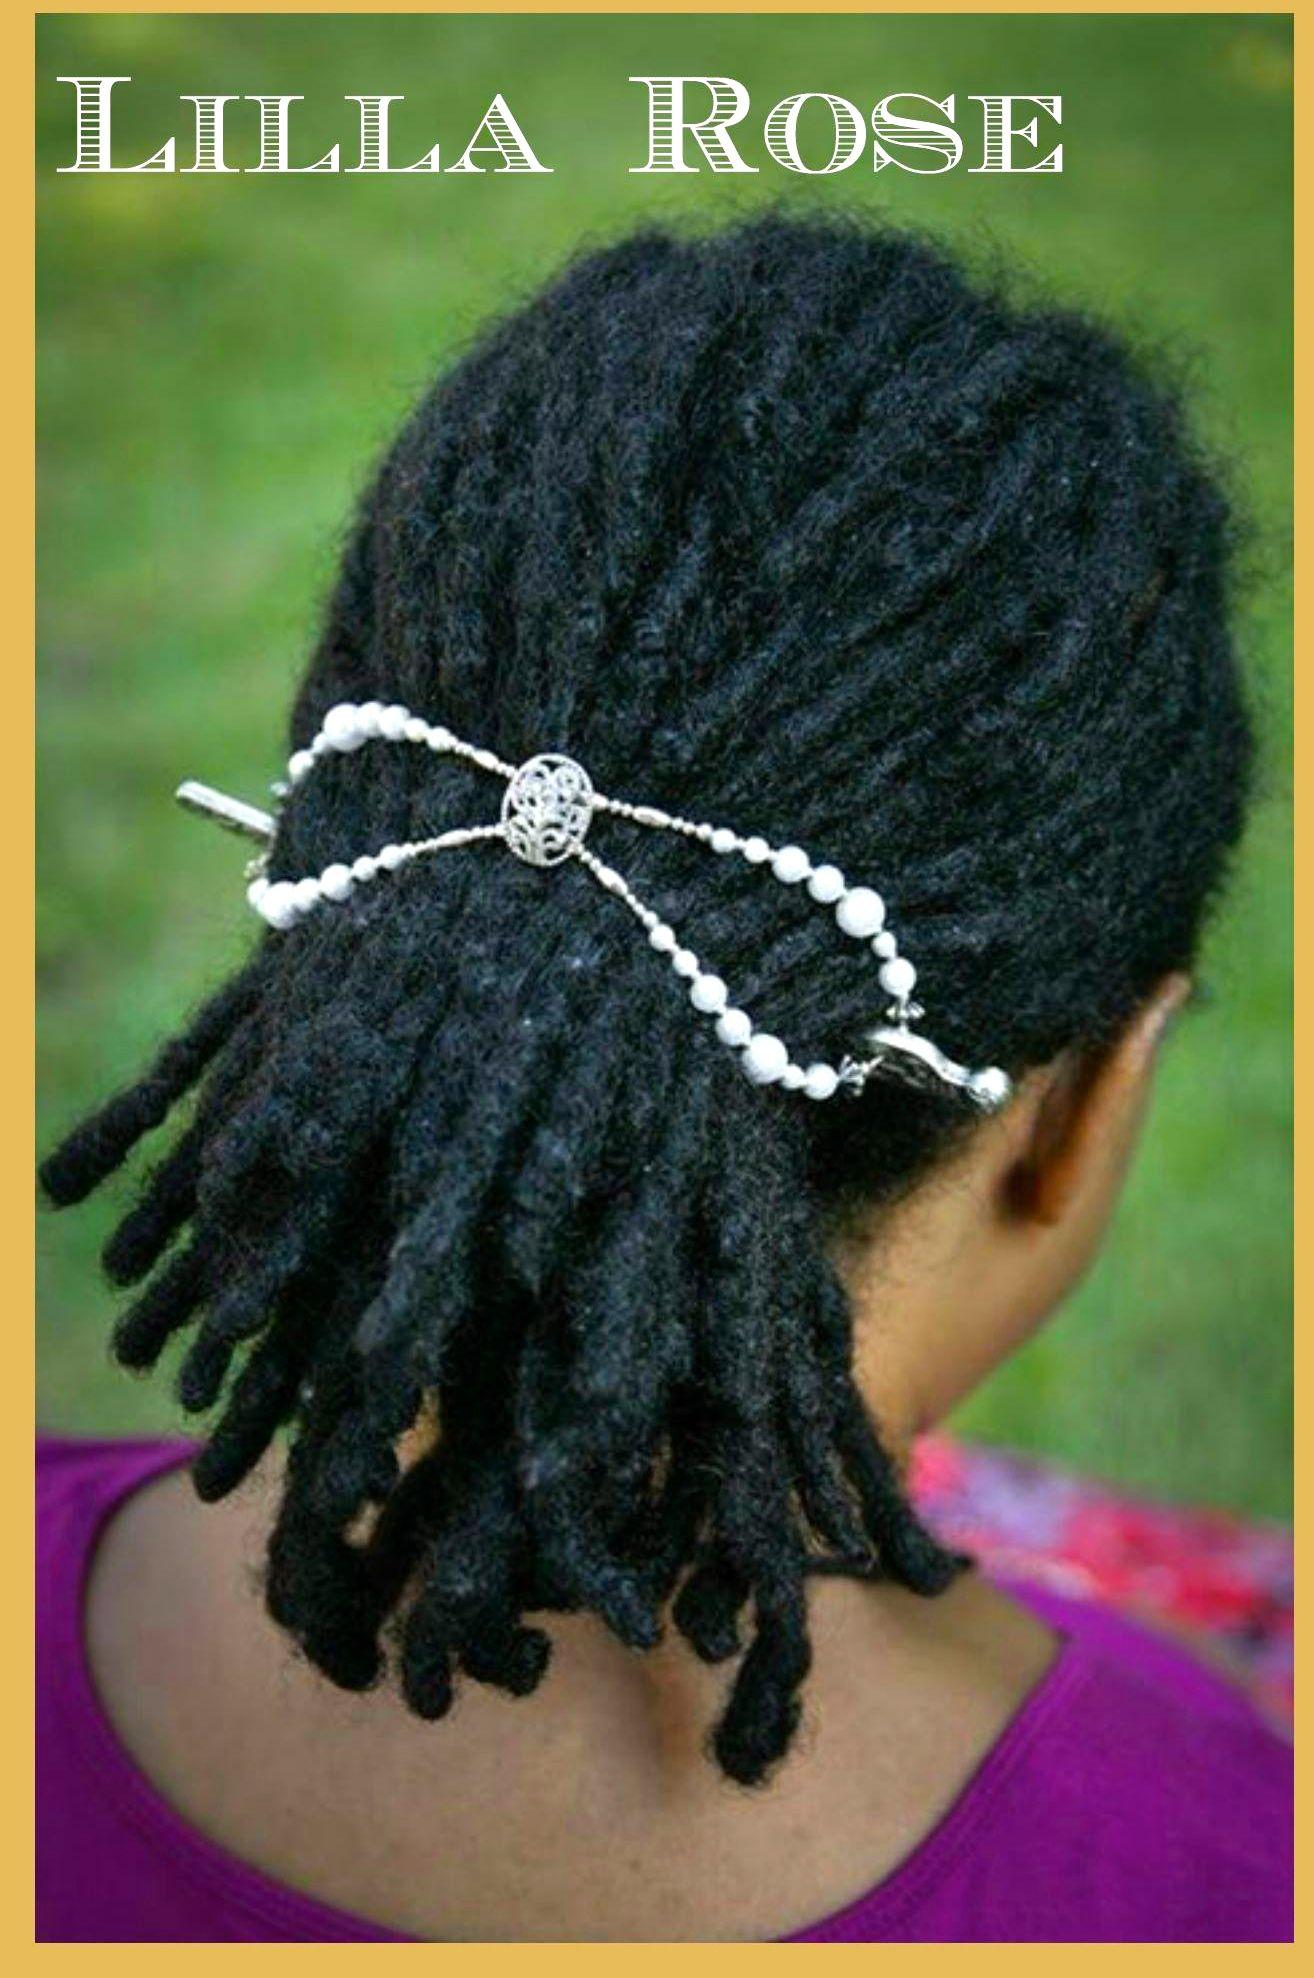 Everyone can wear their hair up with comfort wwwlillarosebiz